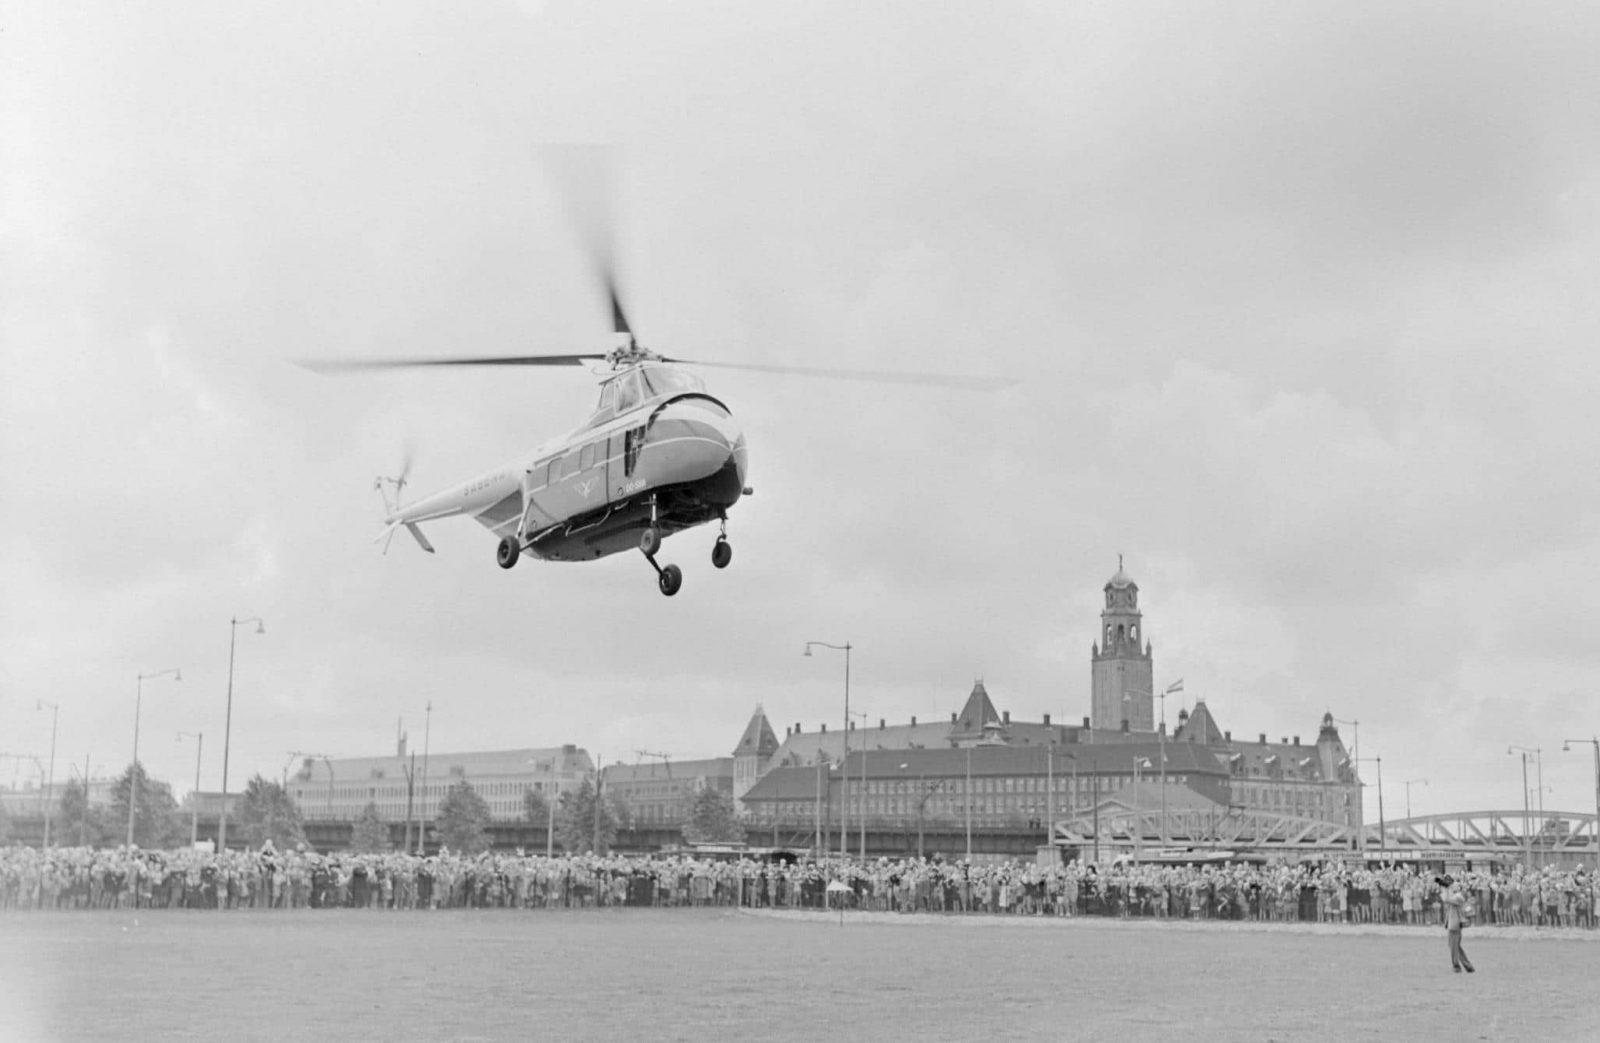 Algemeen6-Heliport-NL-Rt SA_4273_L-271